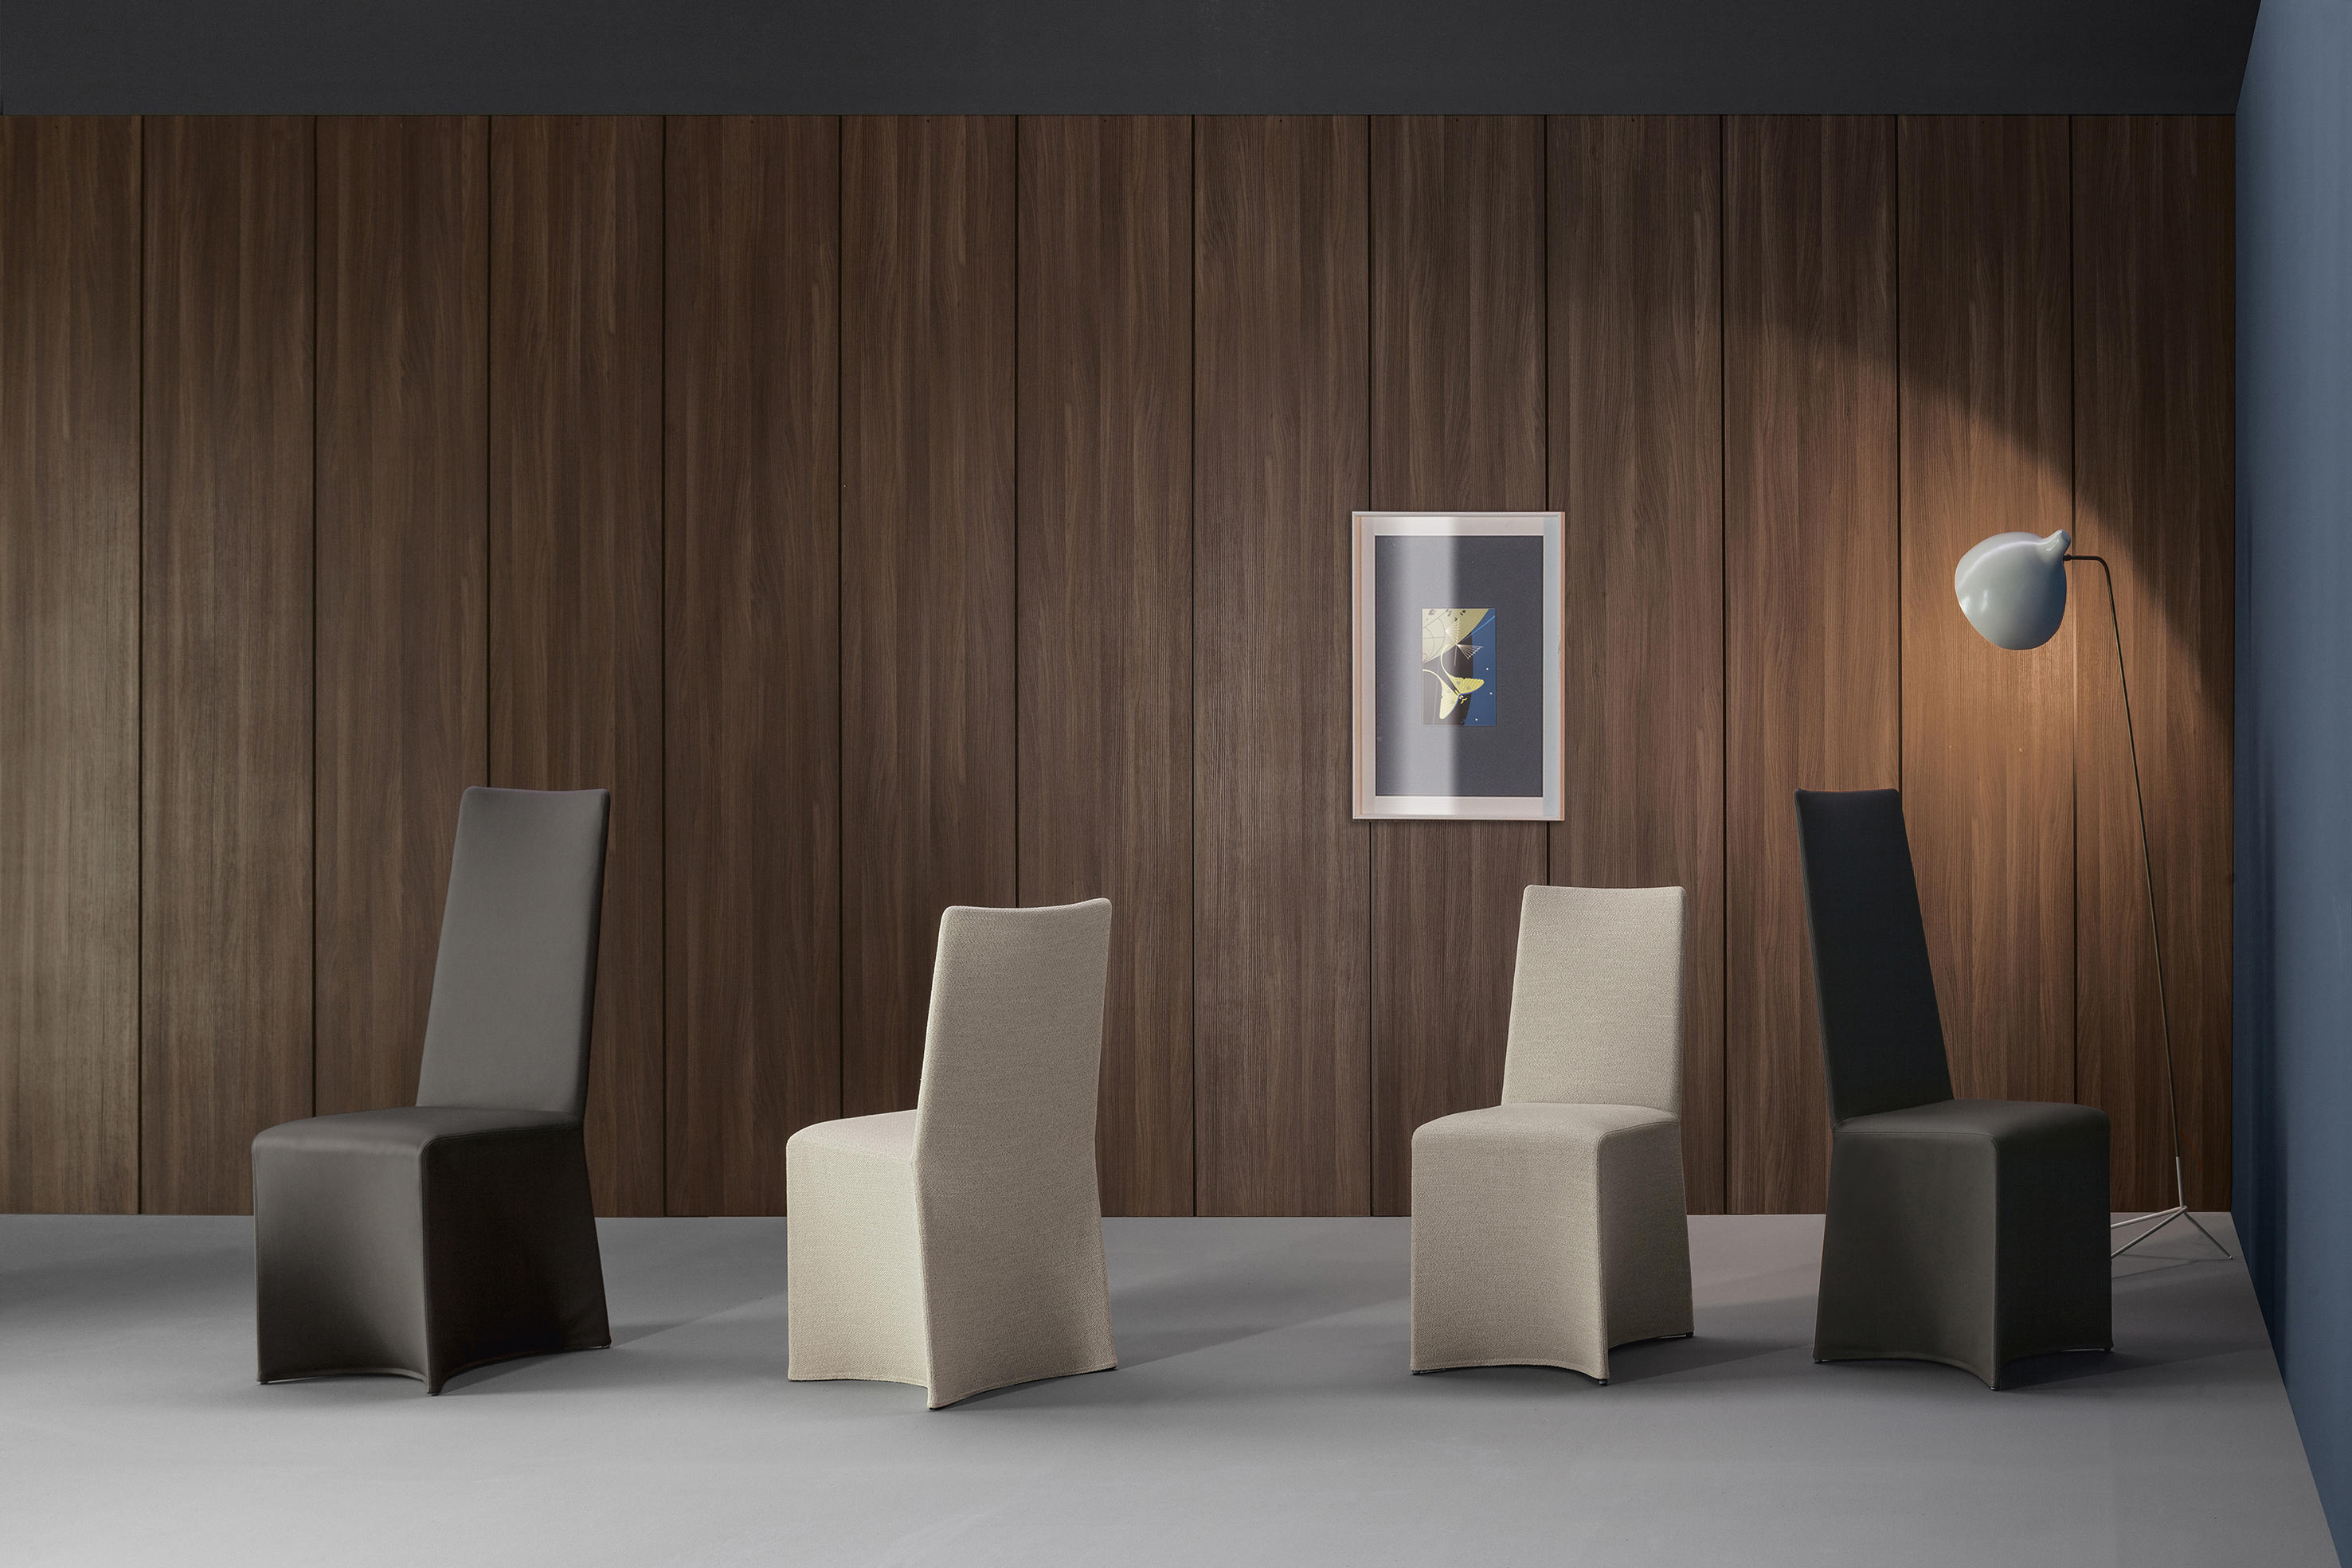 Liry Chair by Bartoli Design for Bonaldo